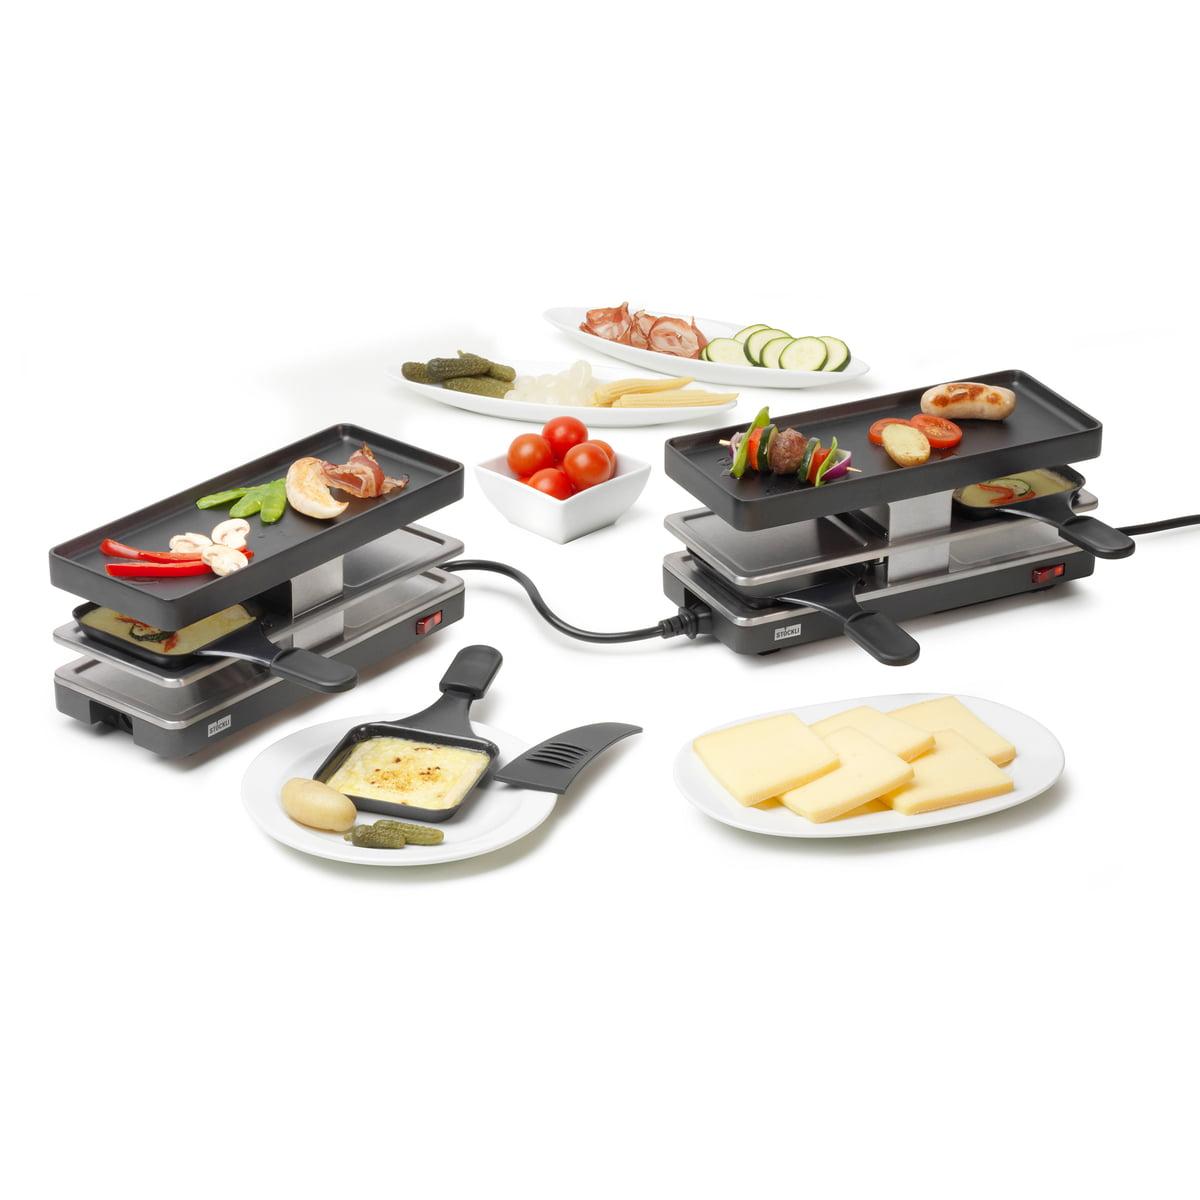 set à raclette twinboard de stöckli | connox